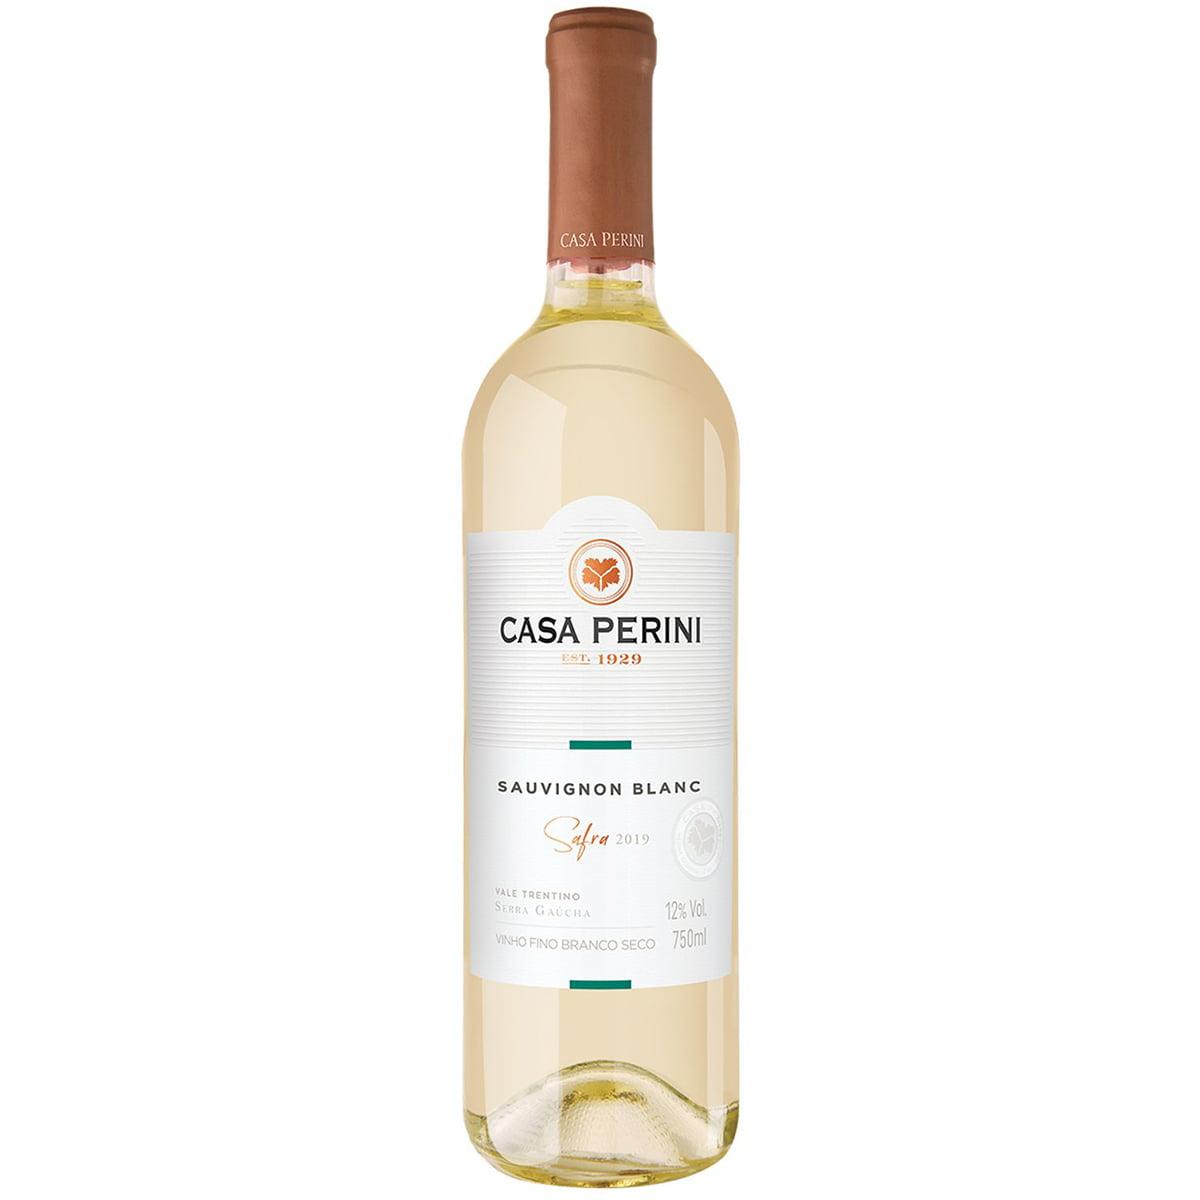 Vinho Casa Perini Sauvignon Blanc Branco Seco 750ml